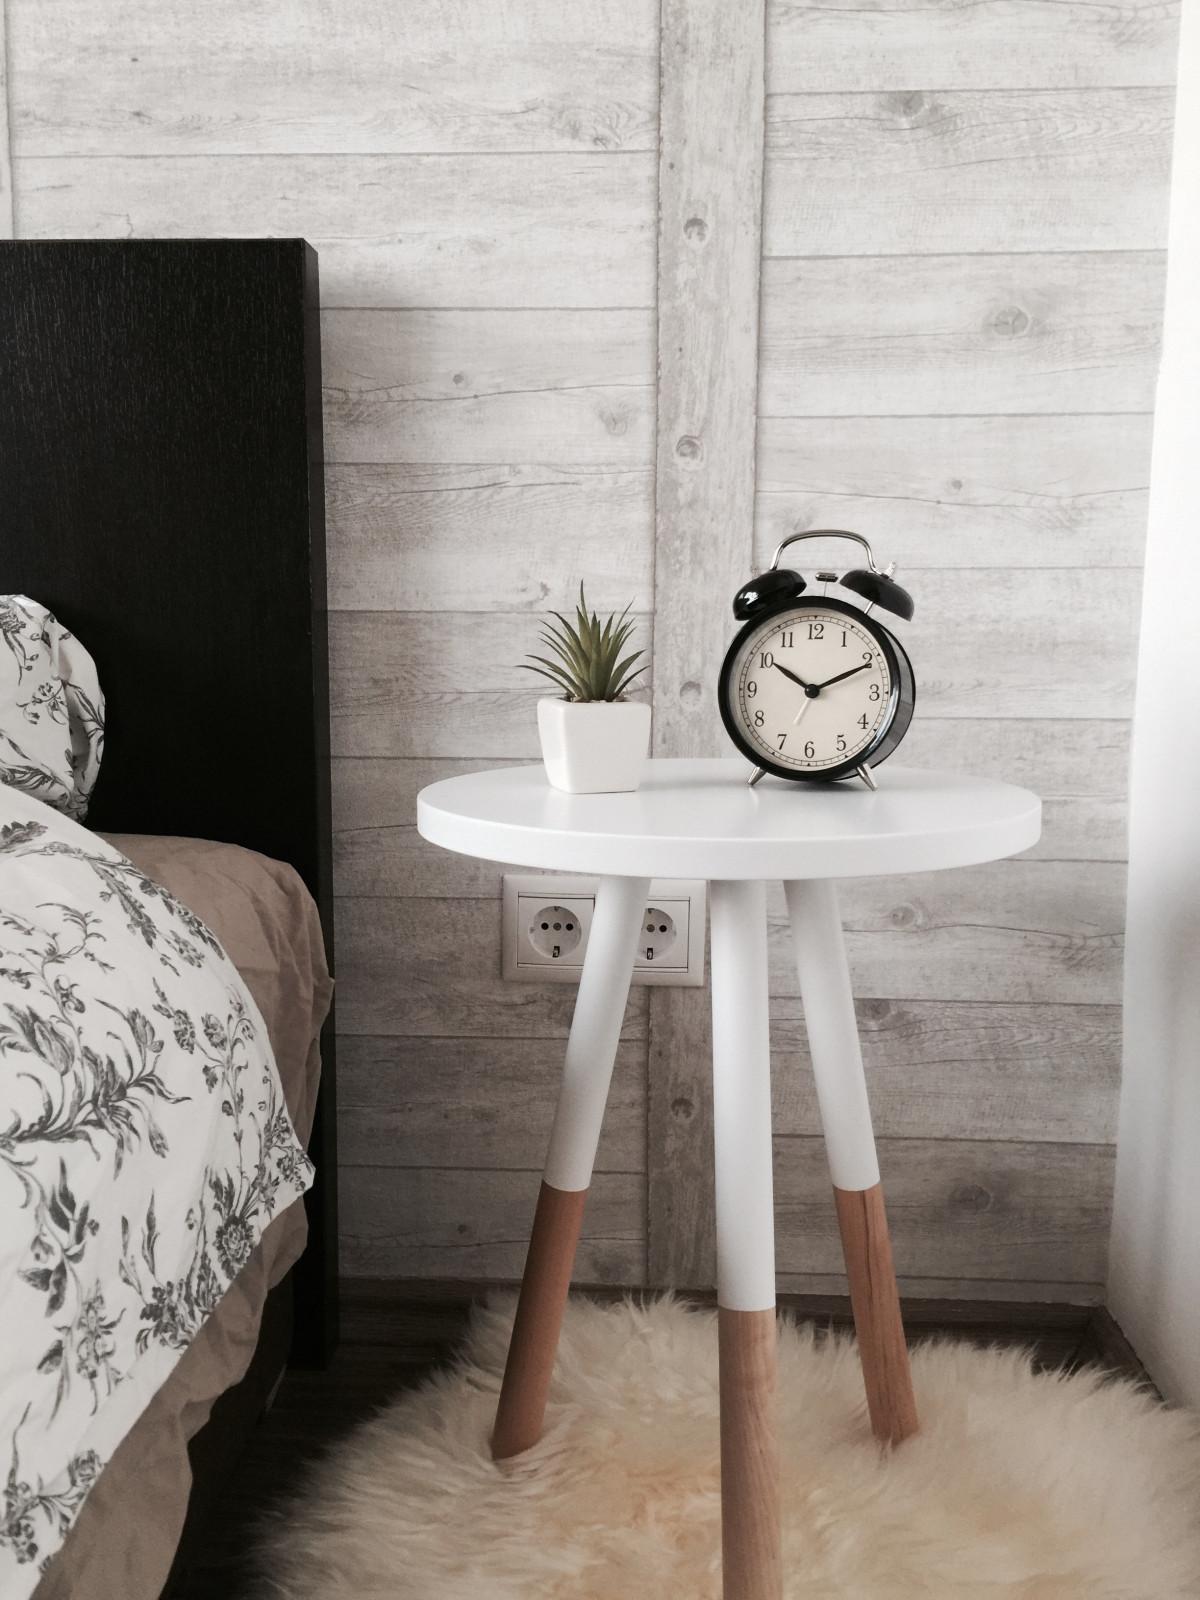 Free Images : desk, wood, floor, home, wall, tool, shelf, living ...